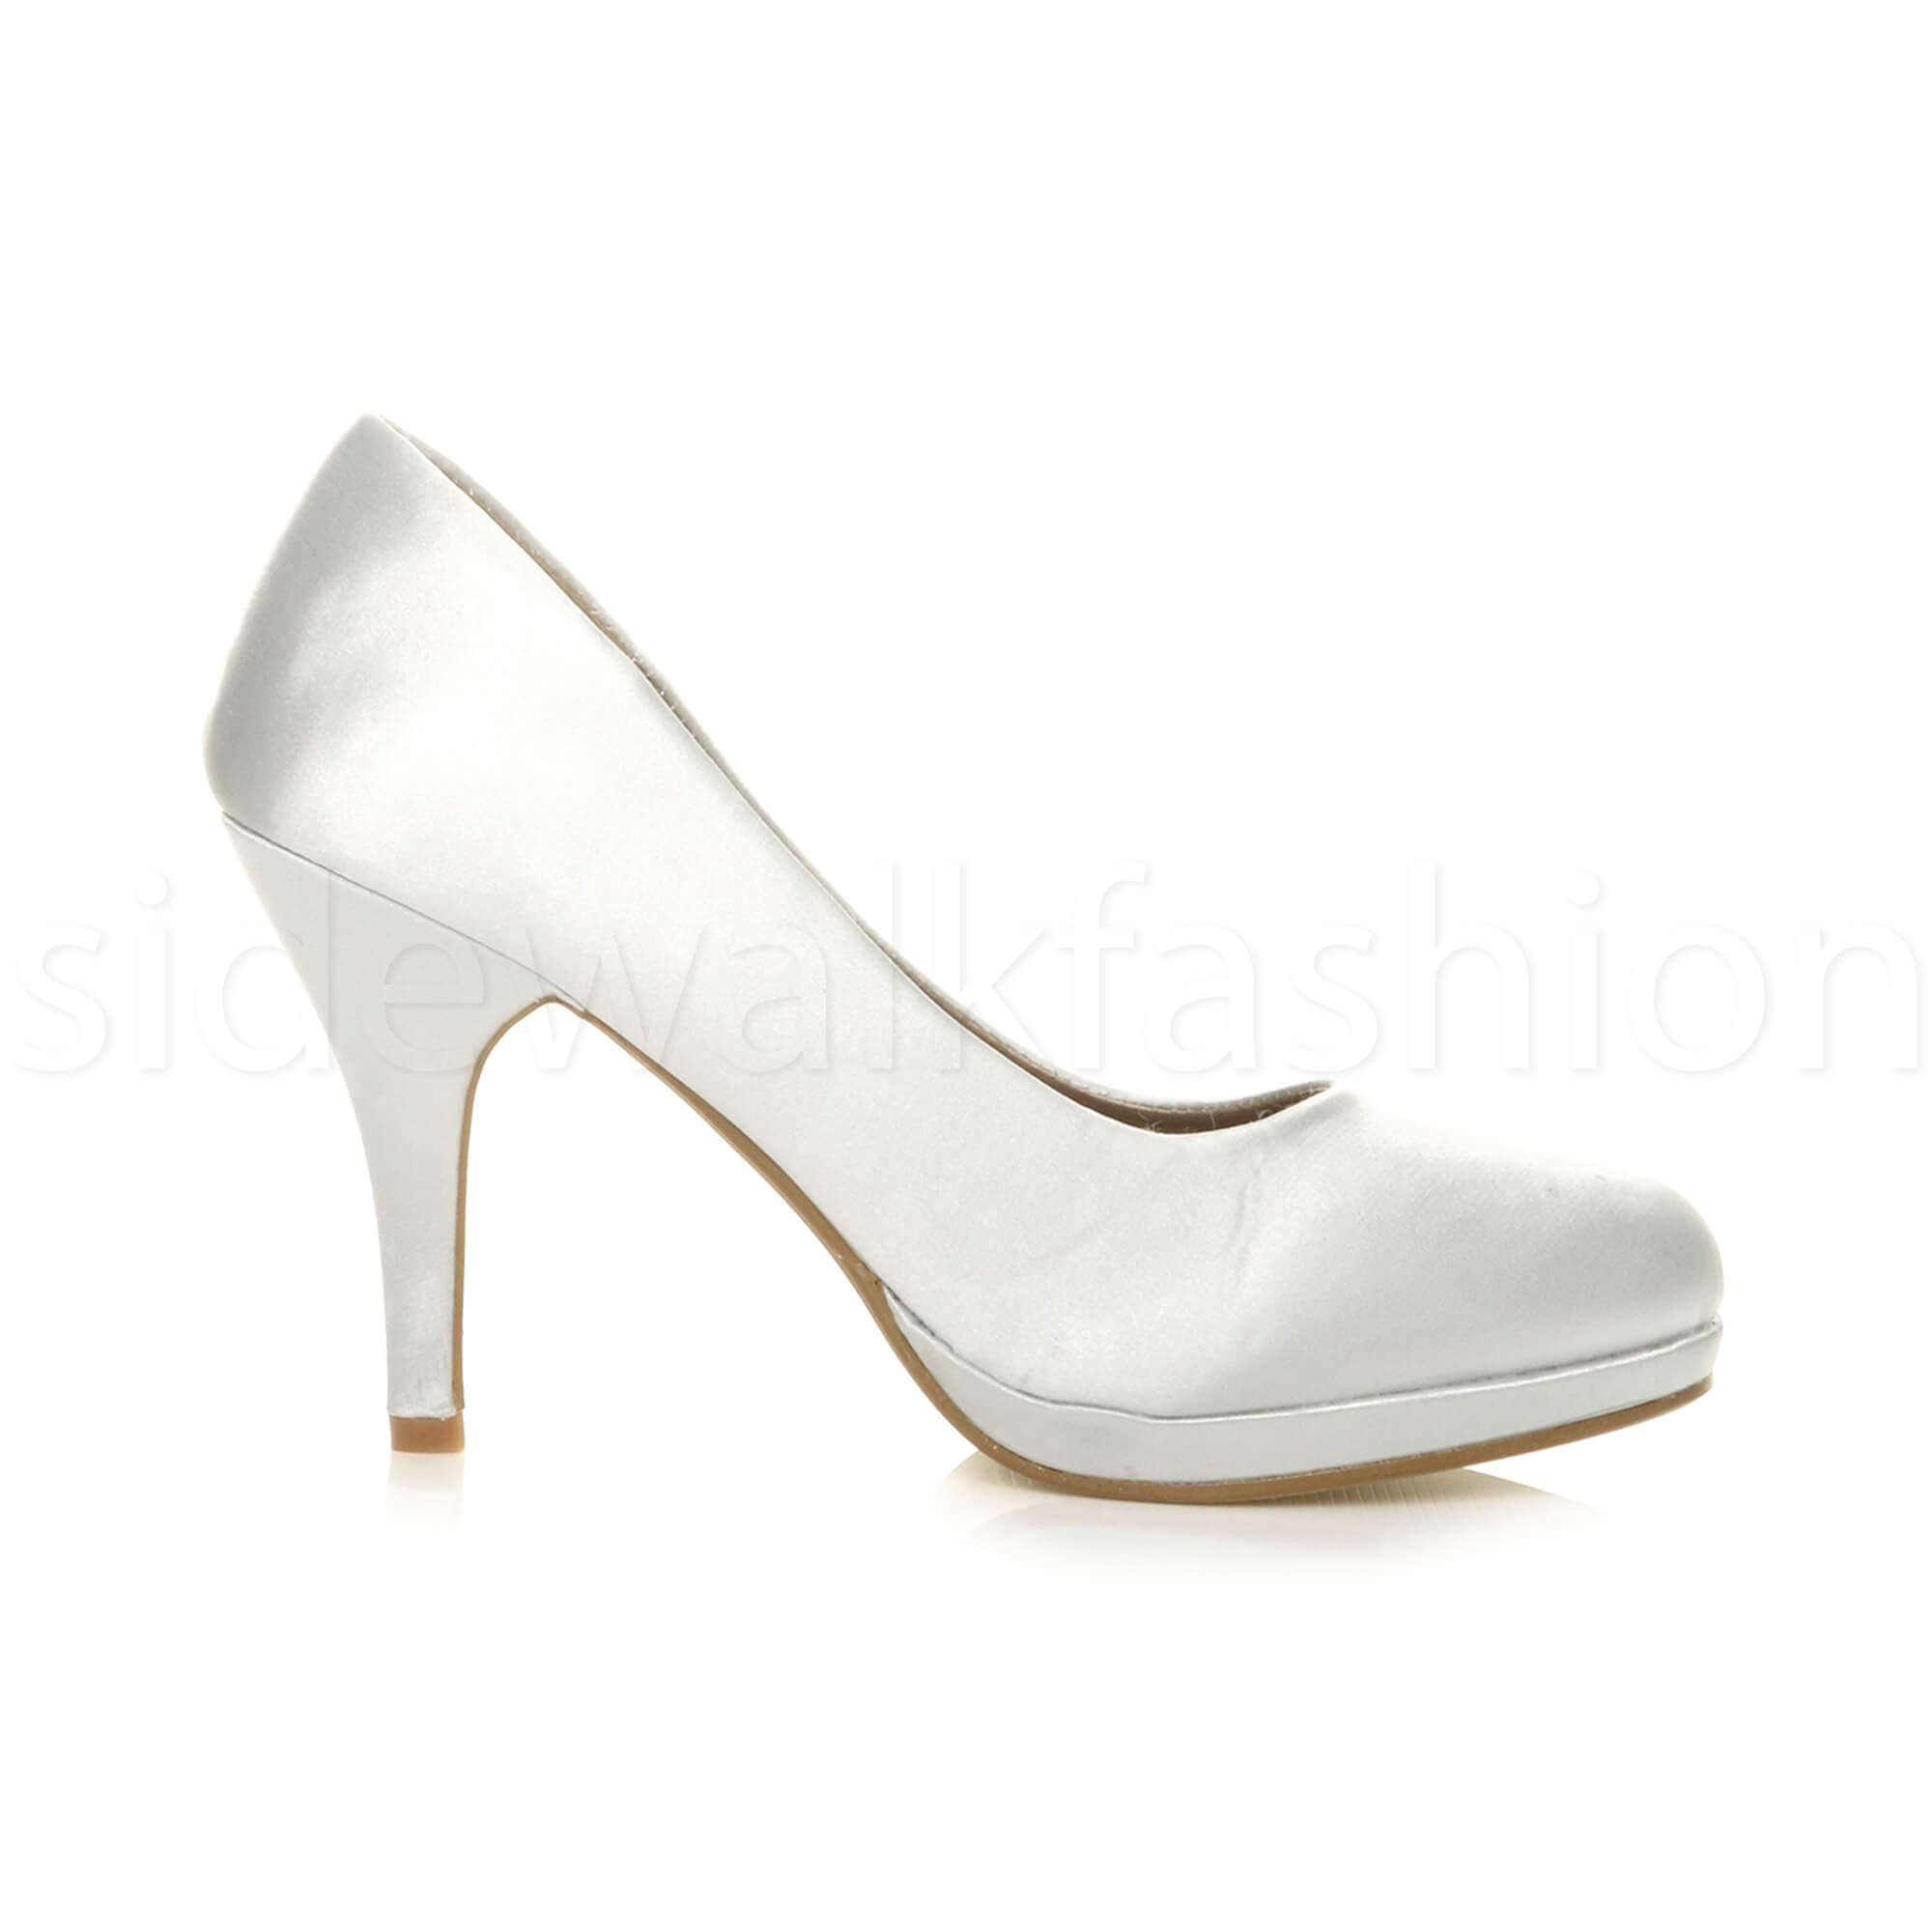 Womens-ladies-high-mid-heel-platform-wedding-evening-bridesmaid-court-shoes-size thumbnail 186